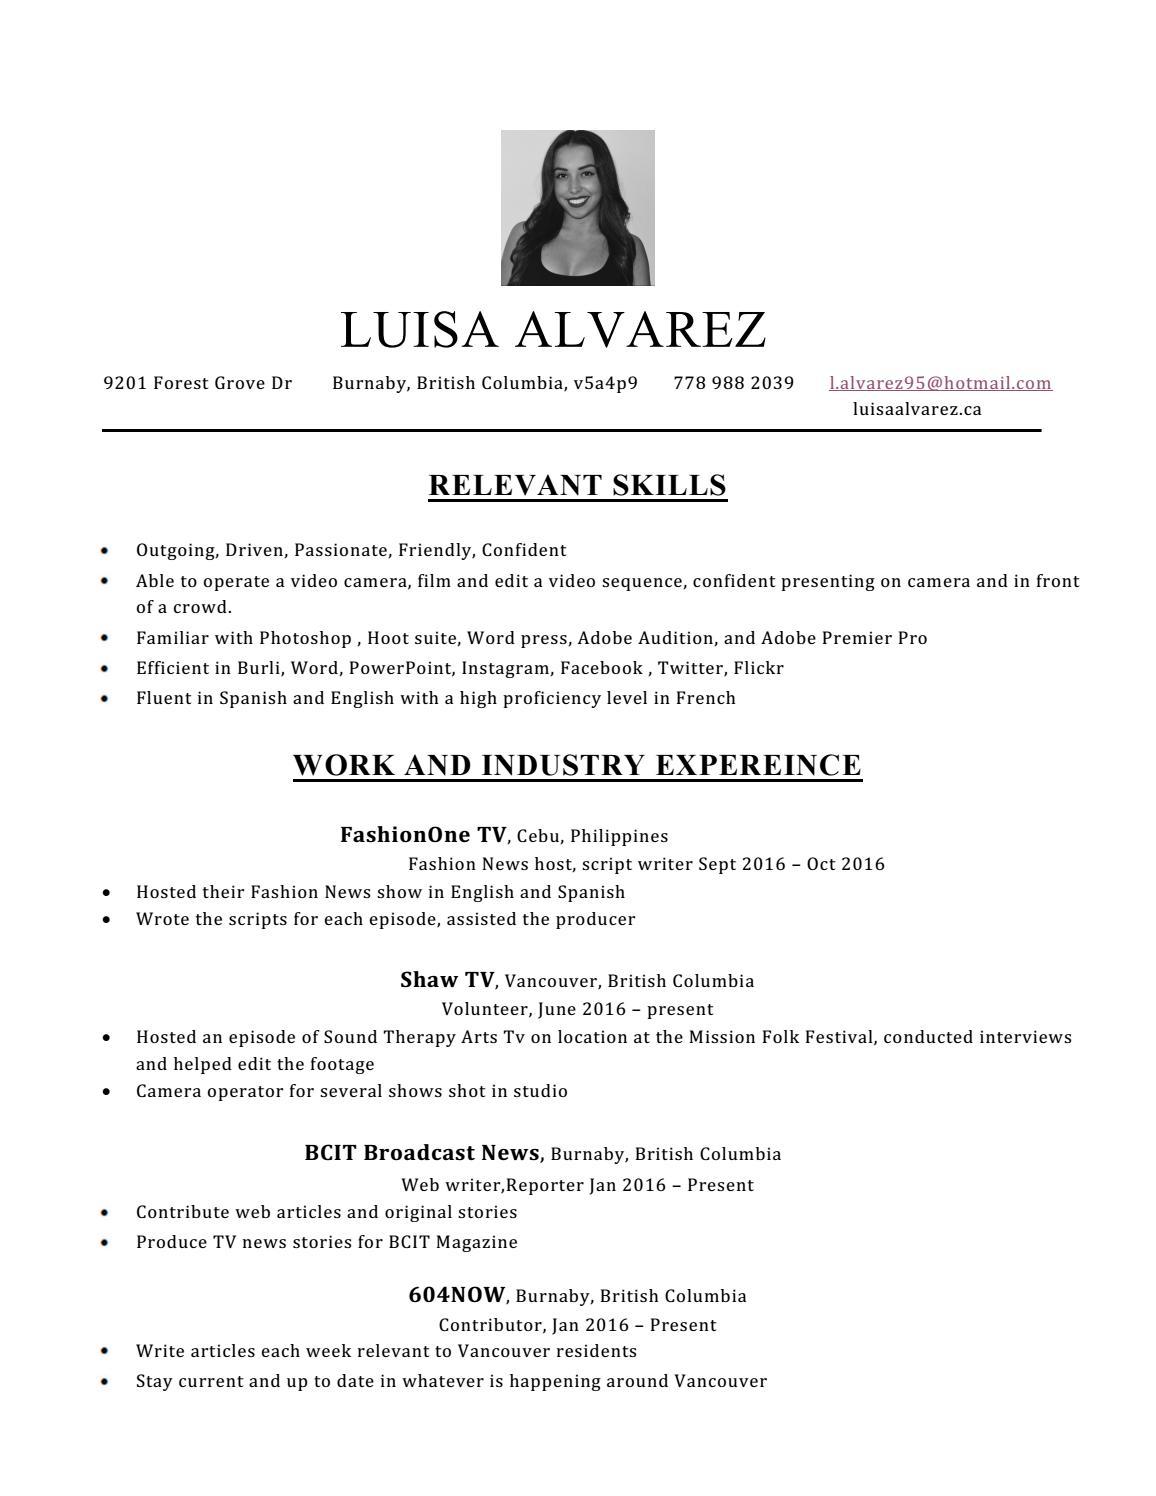 Luisa Alvarez CV 2016 by Luisa Alvarez - issuu